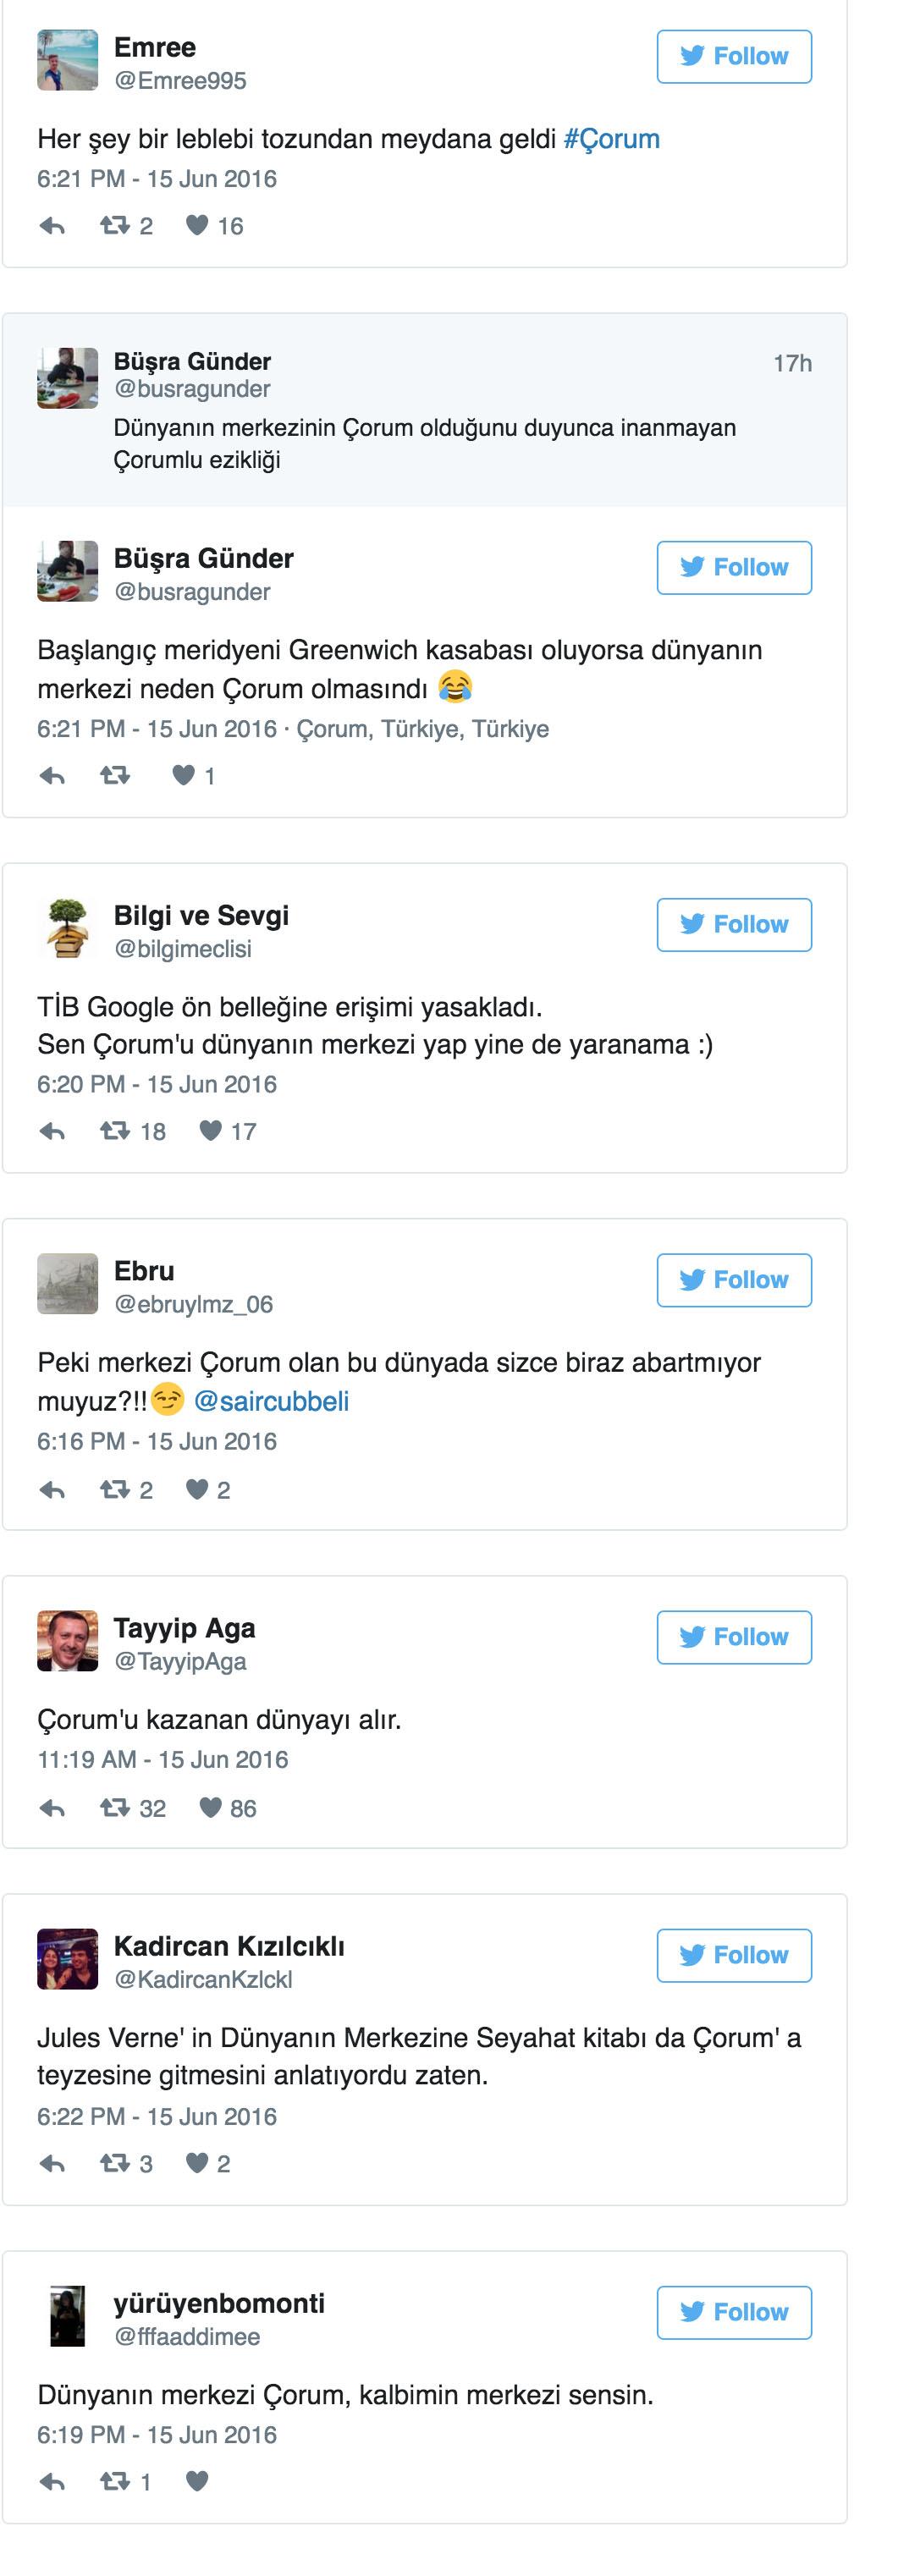 screencapture-www-diken-com-tr-dunyanin-merkezi-oldugu-one-surulen-corumun-belediye-baskani-sasirmadik-1466068474099-copy.jpg